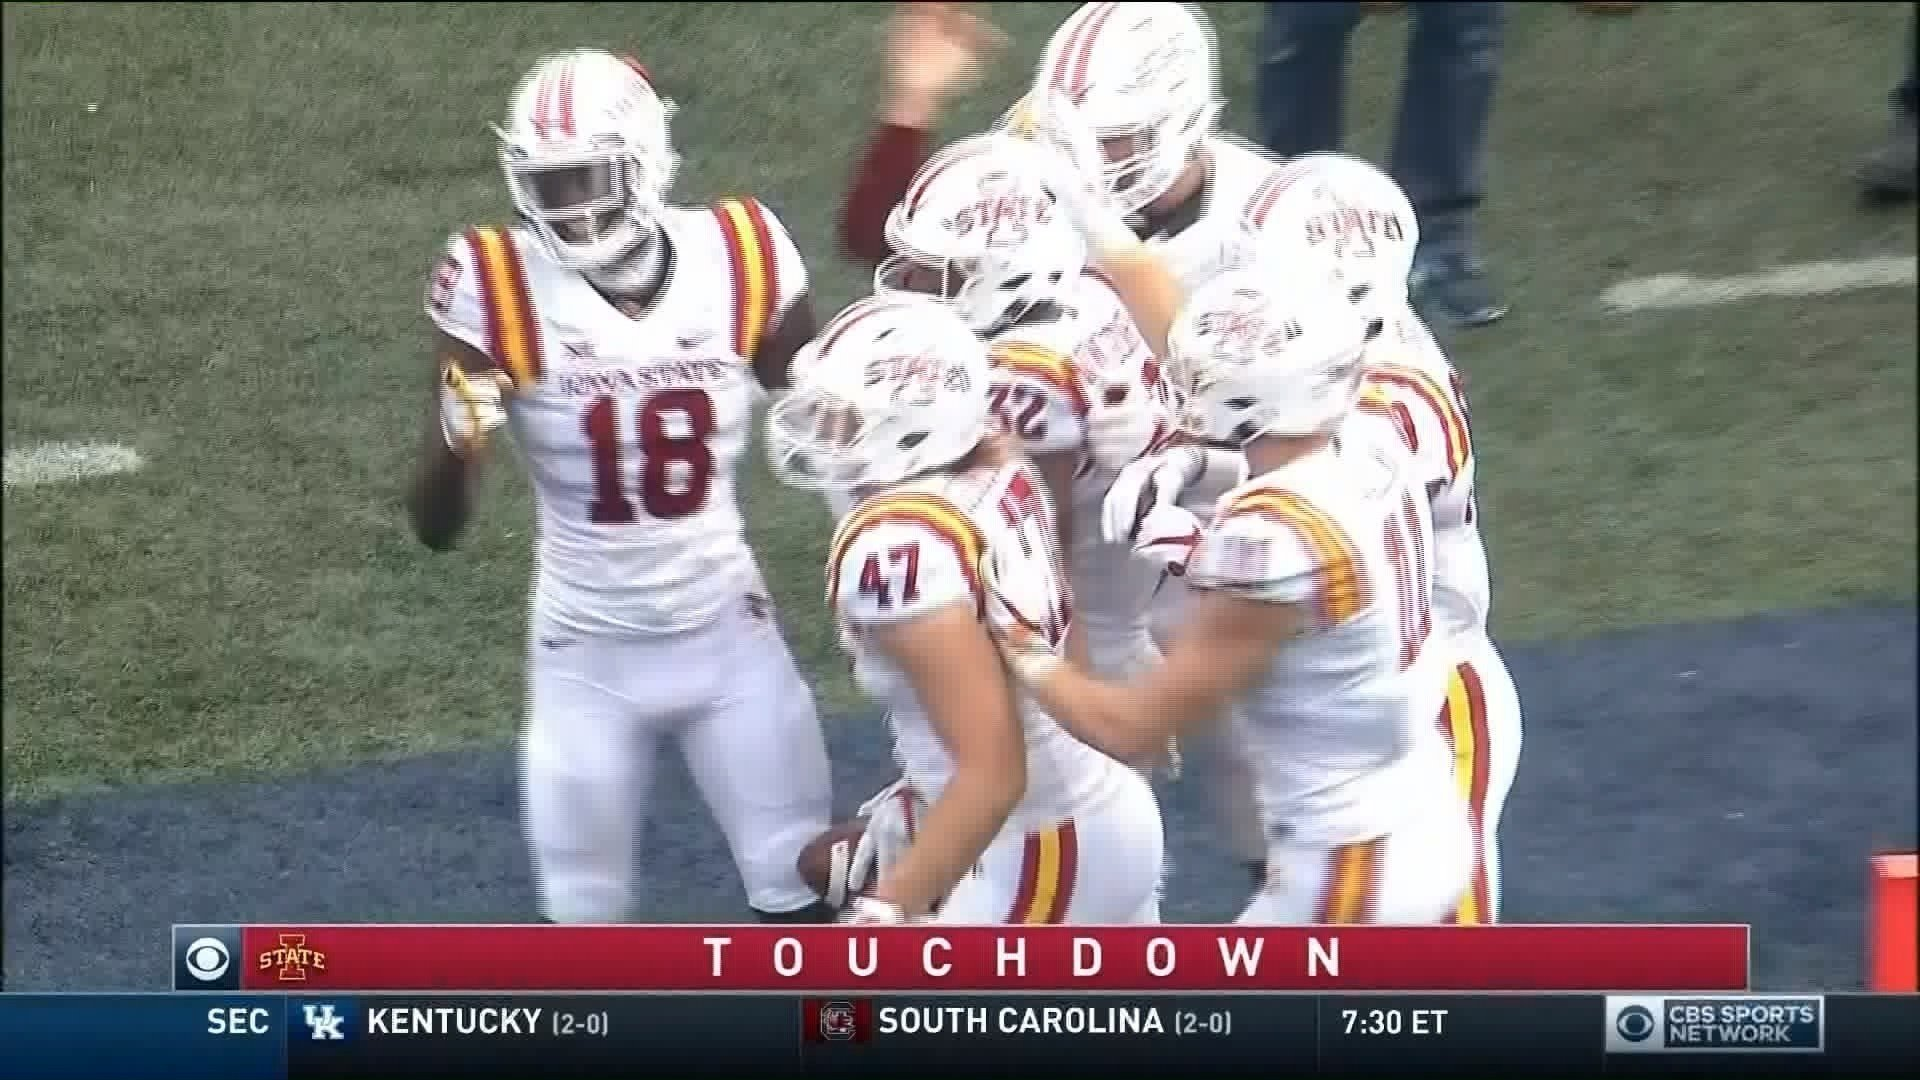 Iowa State beat Akron on Saturday, 41-14.